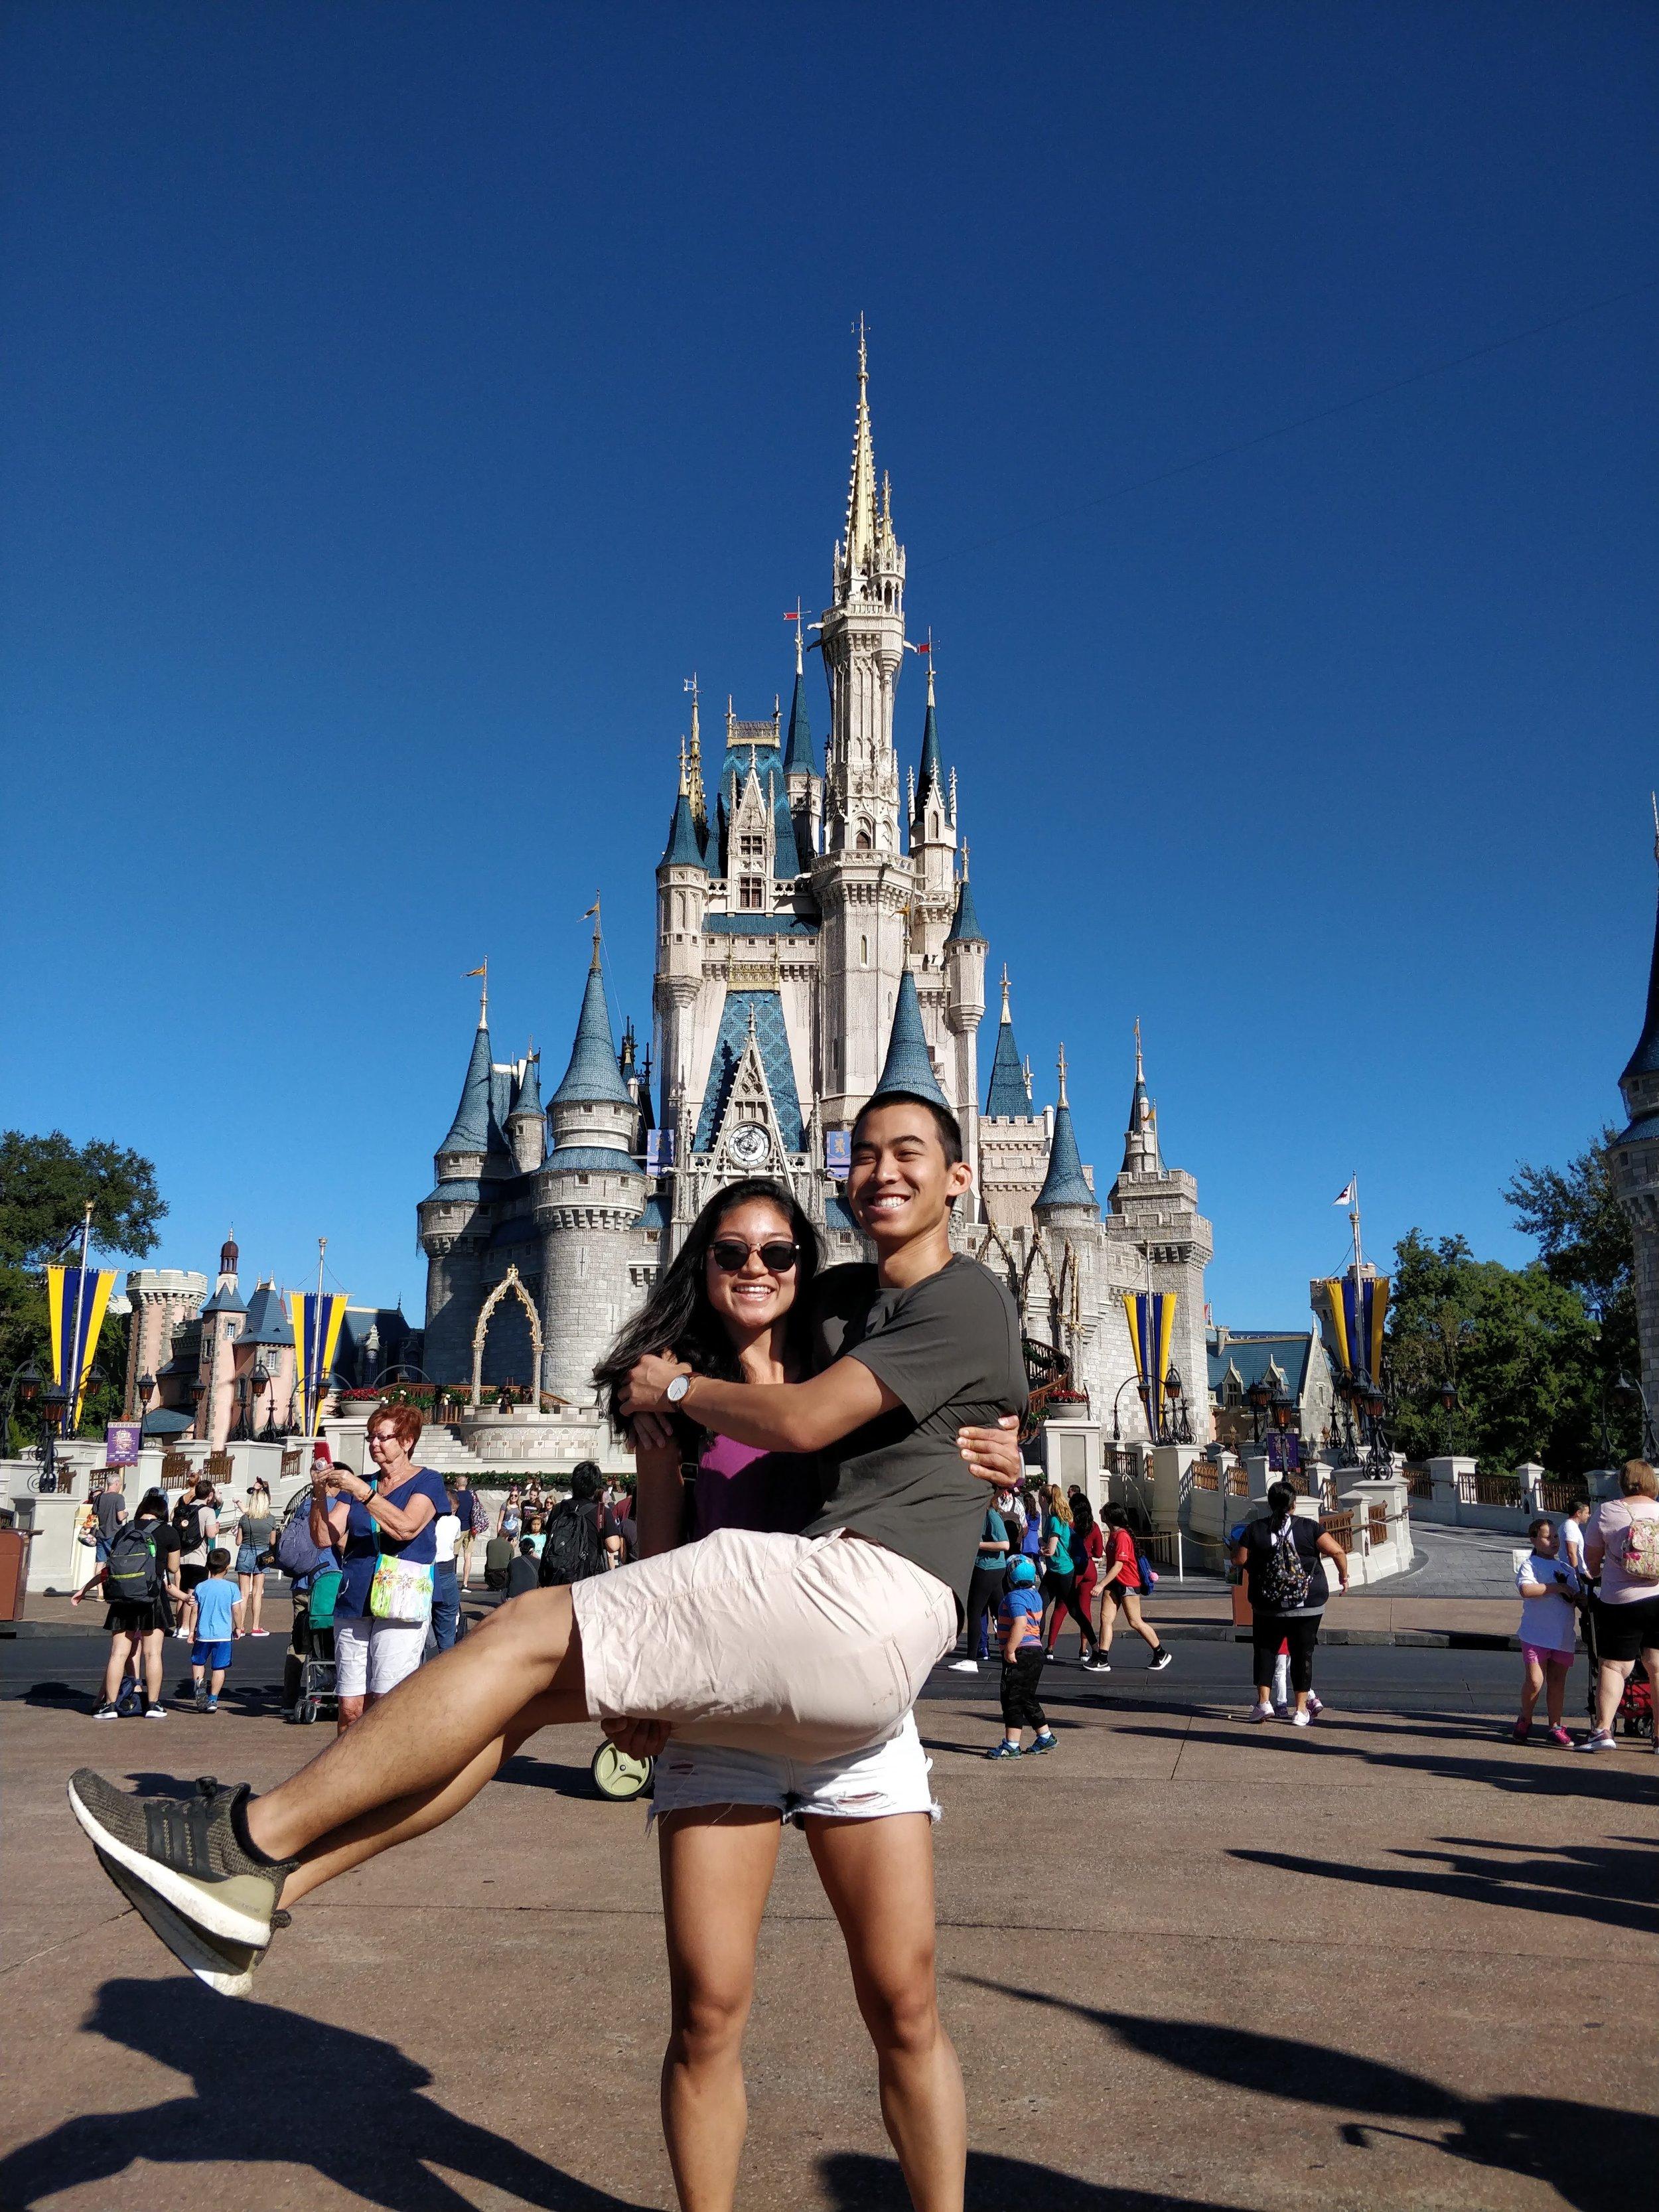 Disneyworld in Florida - 2018